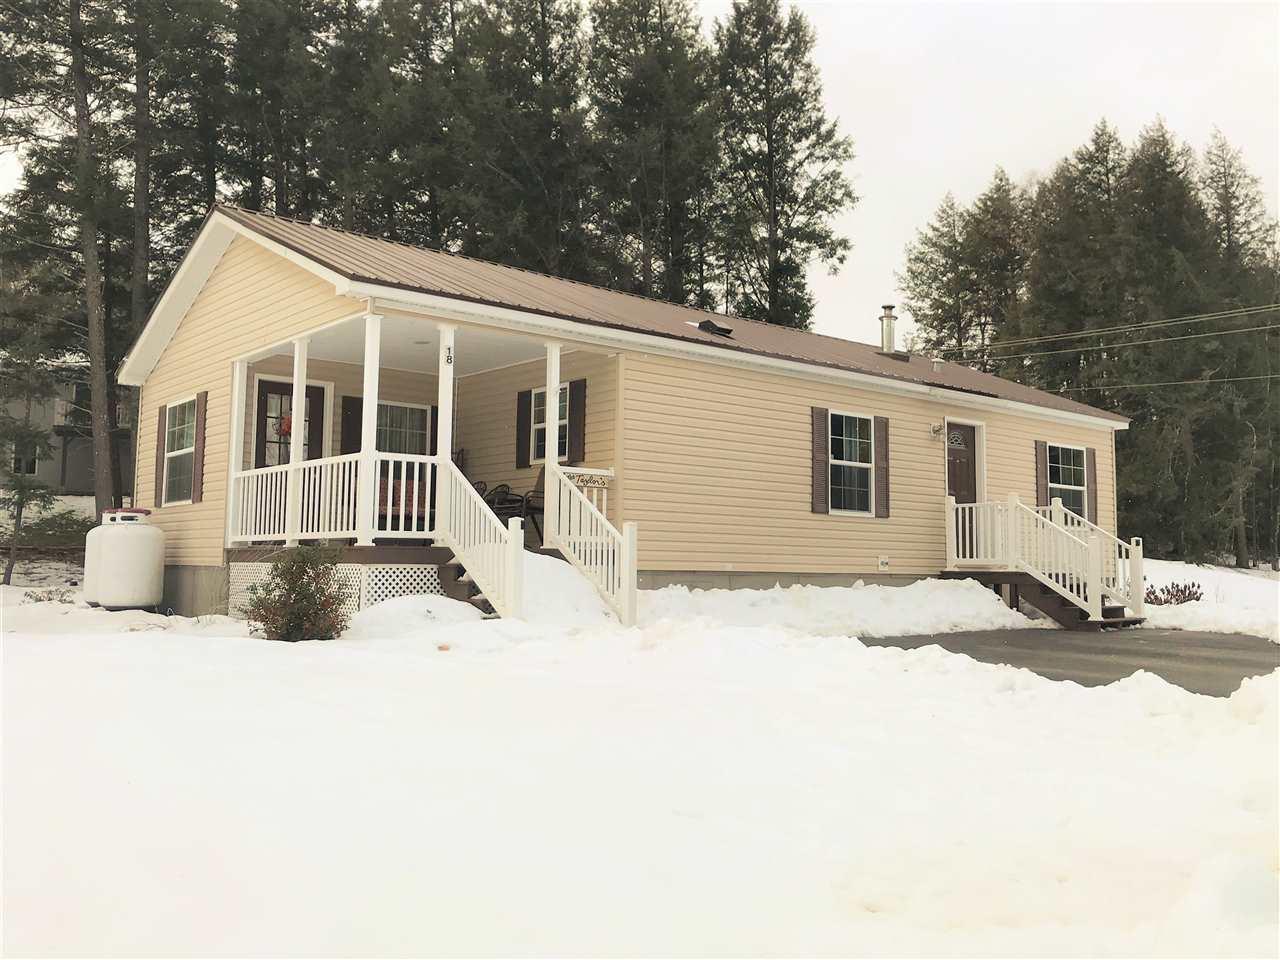 NEW HAMPTON NH Home for sale $96,900